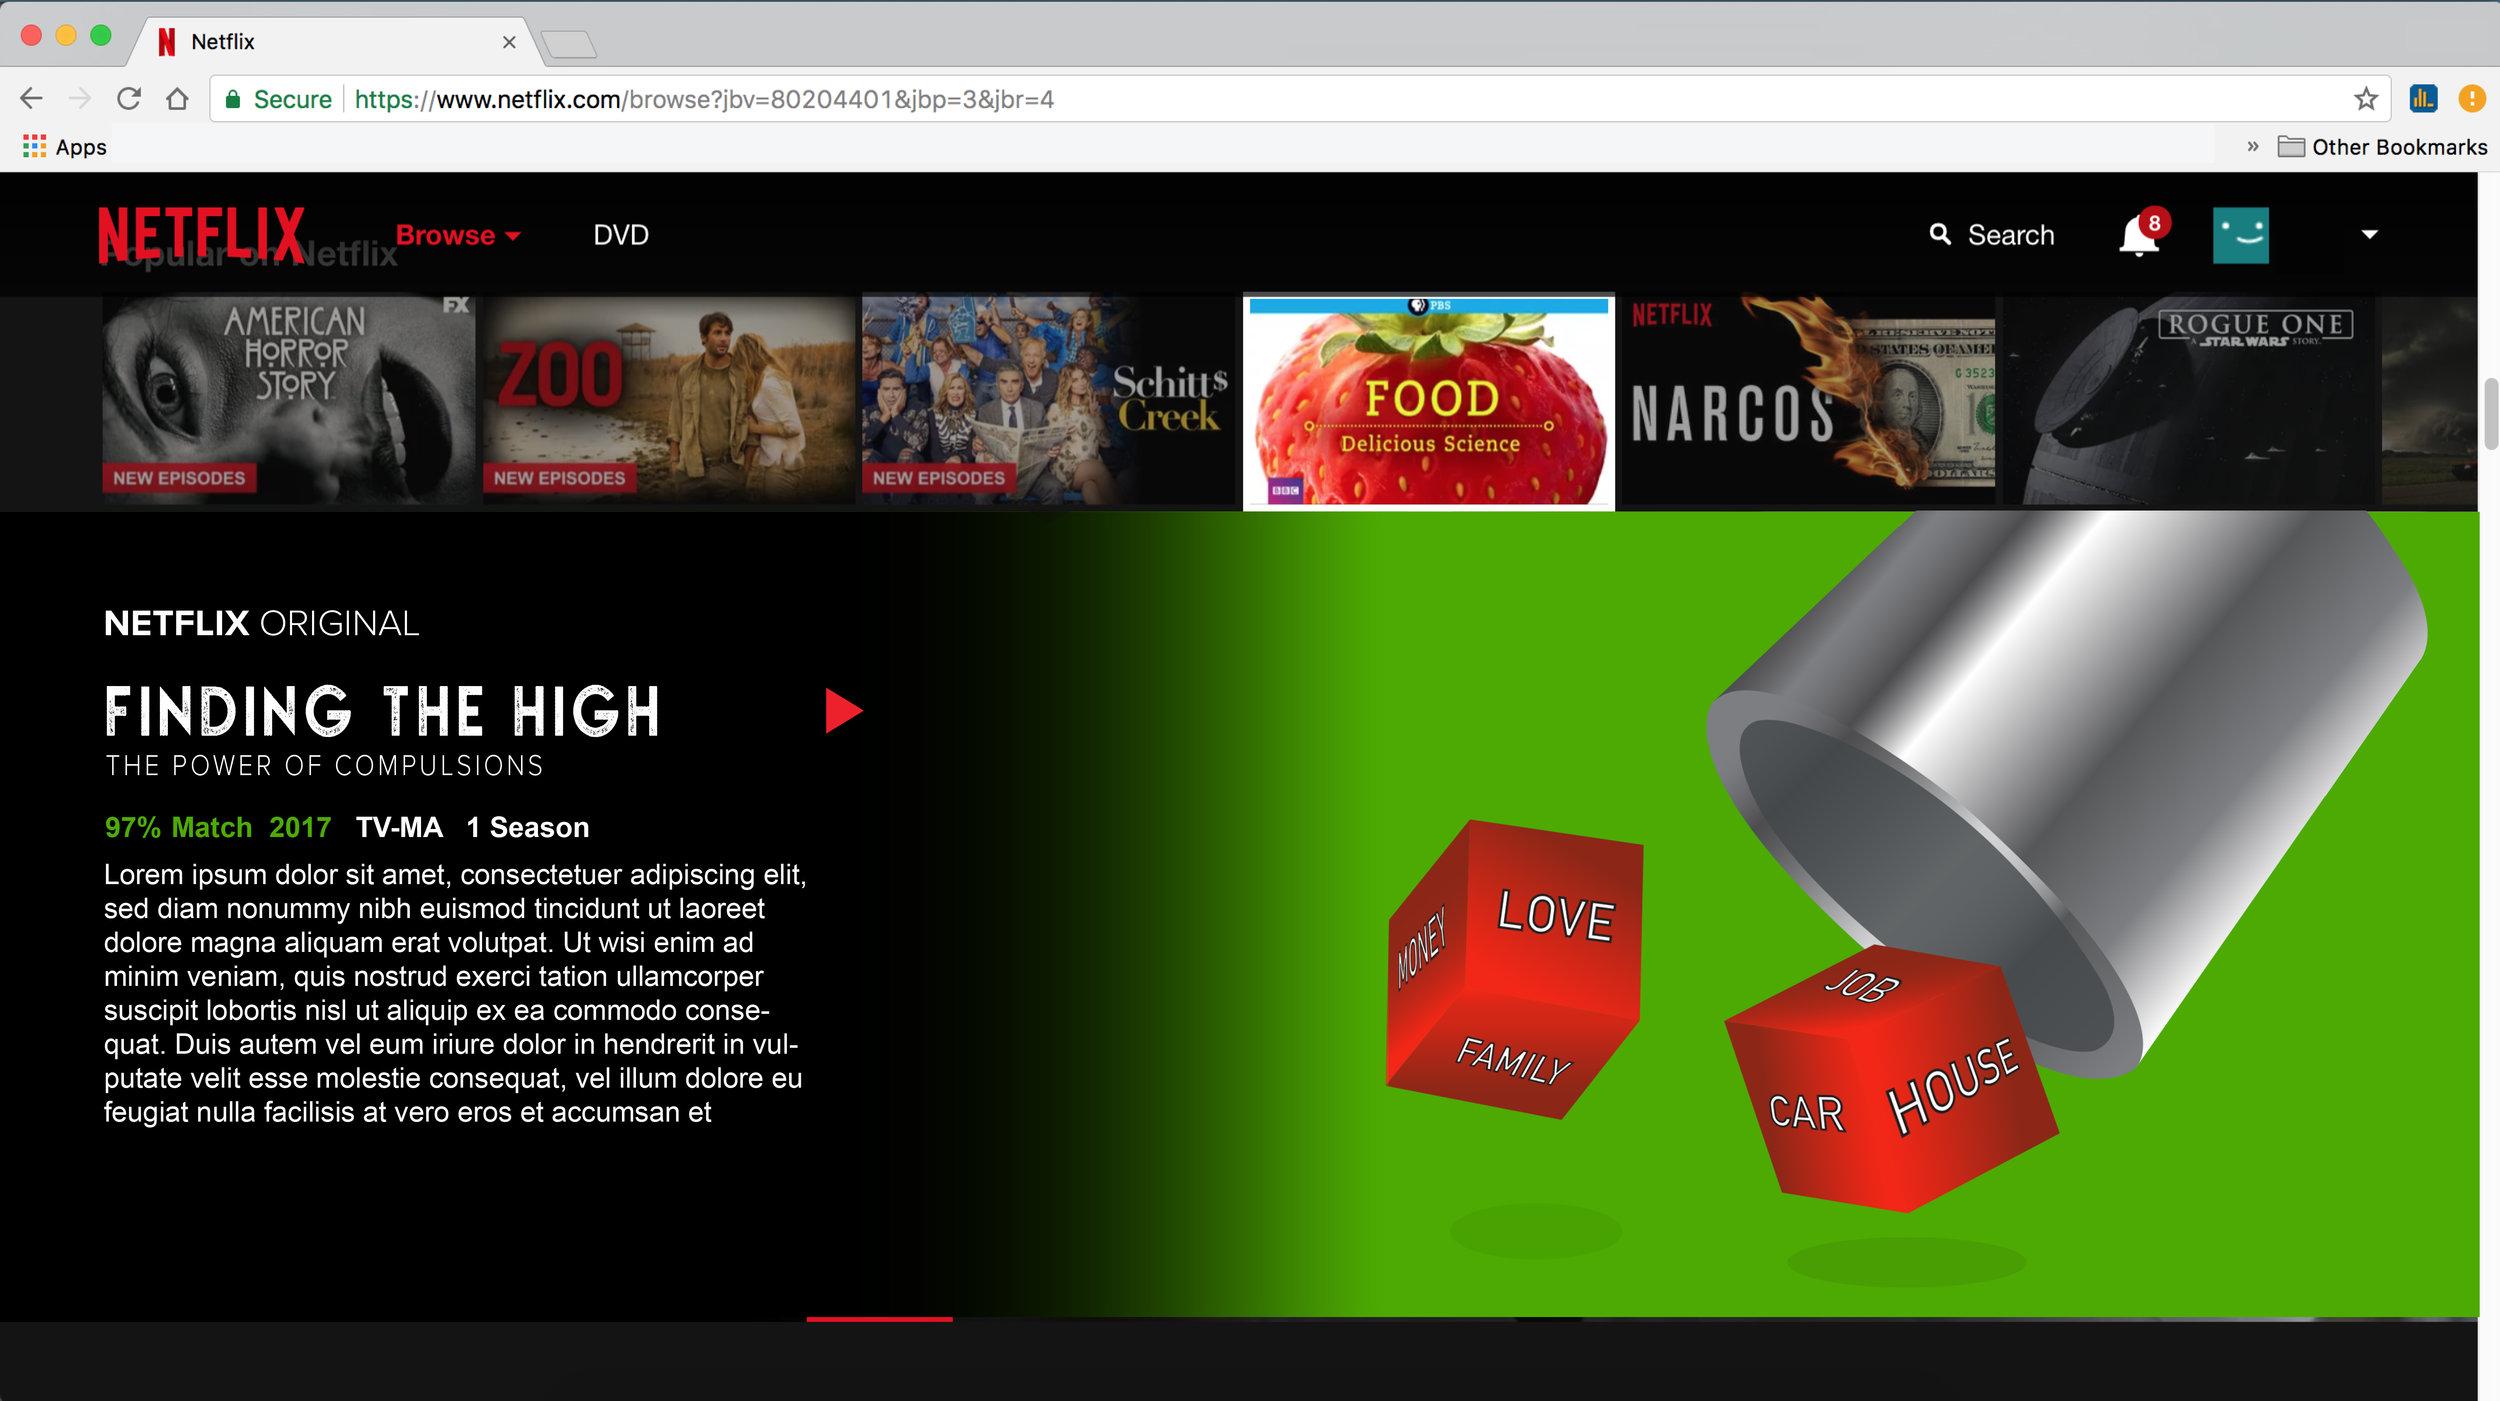 Netflix_Webpage.jpg